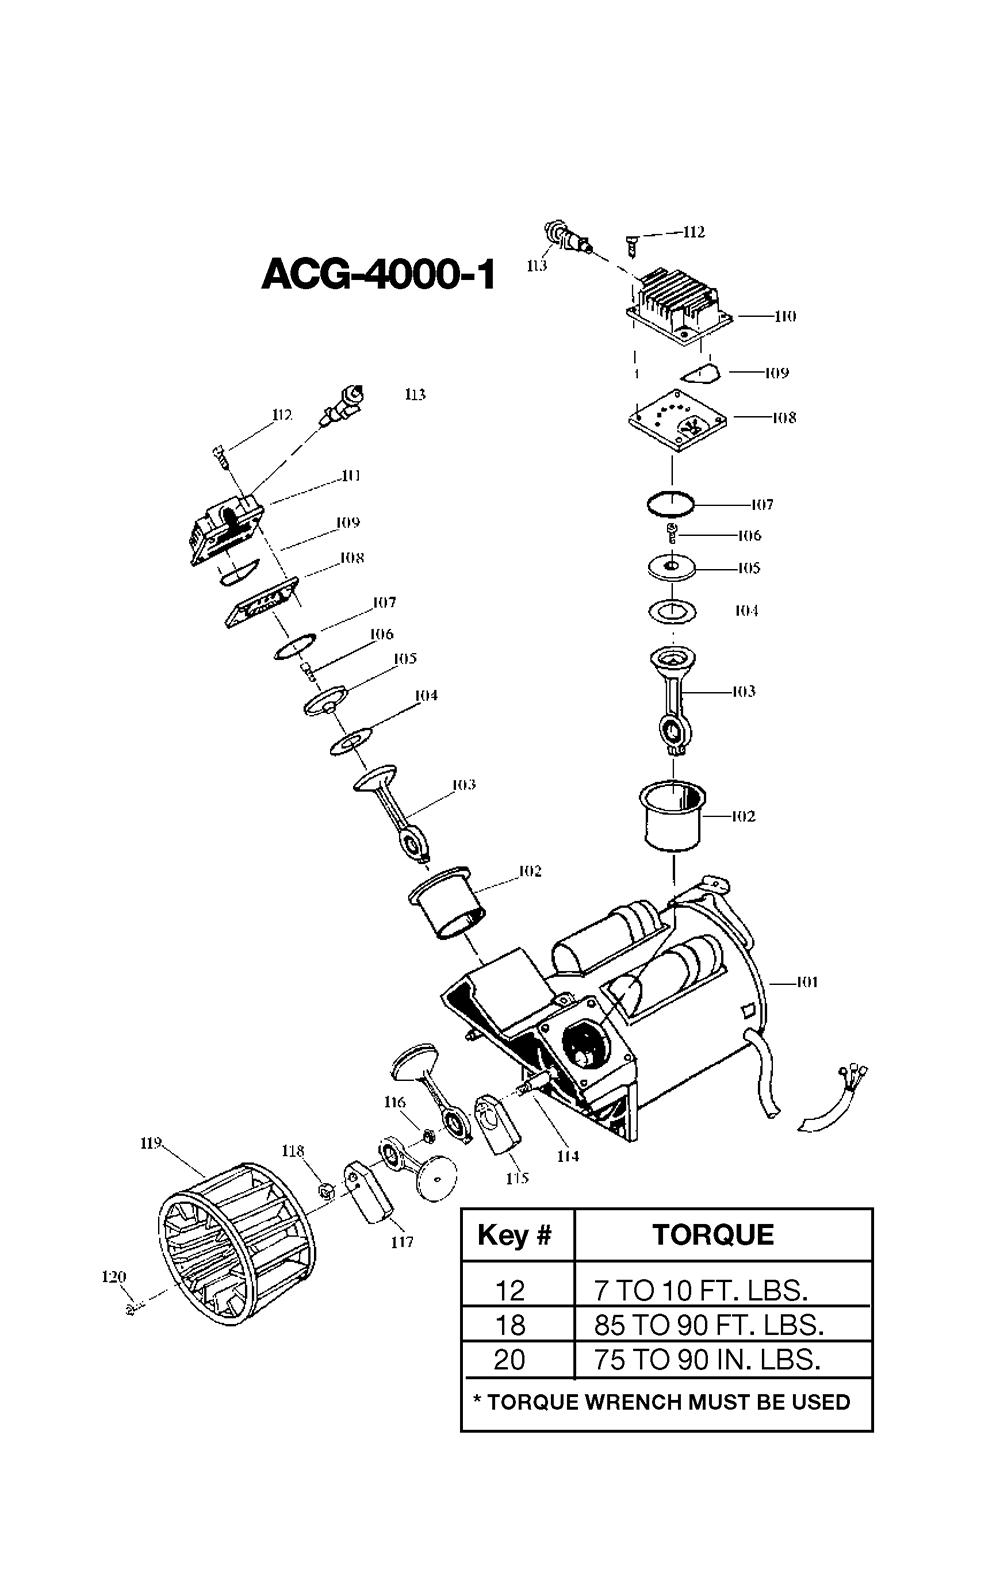 IRC500TVE60V-BlackandDecker-T0-PB-1Break Down